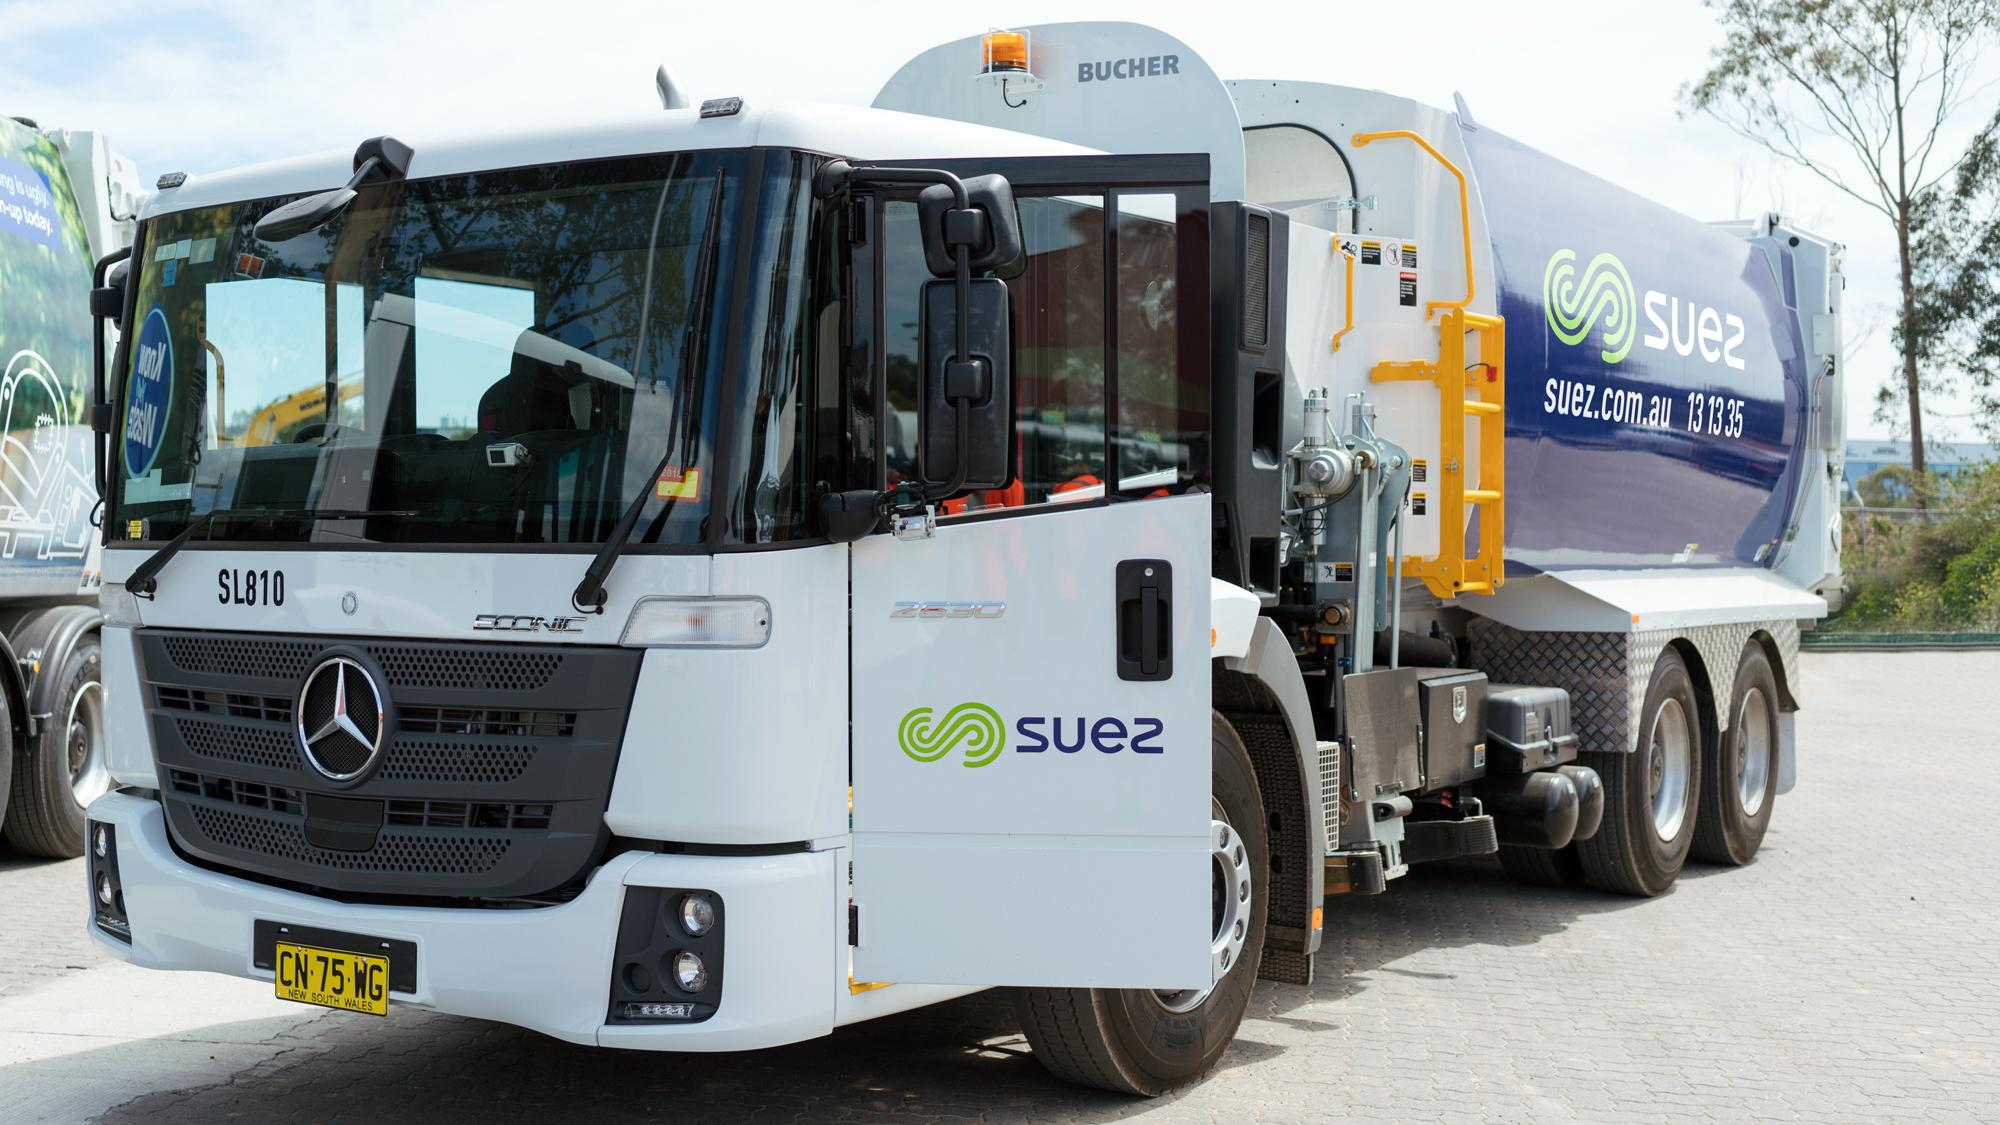 SUEZ waste management equipment image header. Image showing Mercedes side lift garbage truck displaying SUEZ livery.